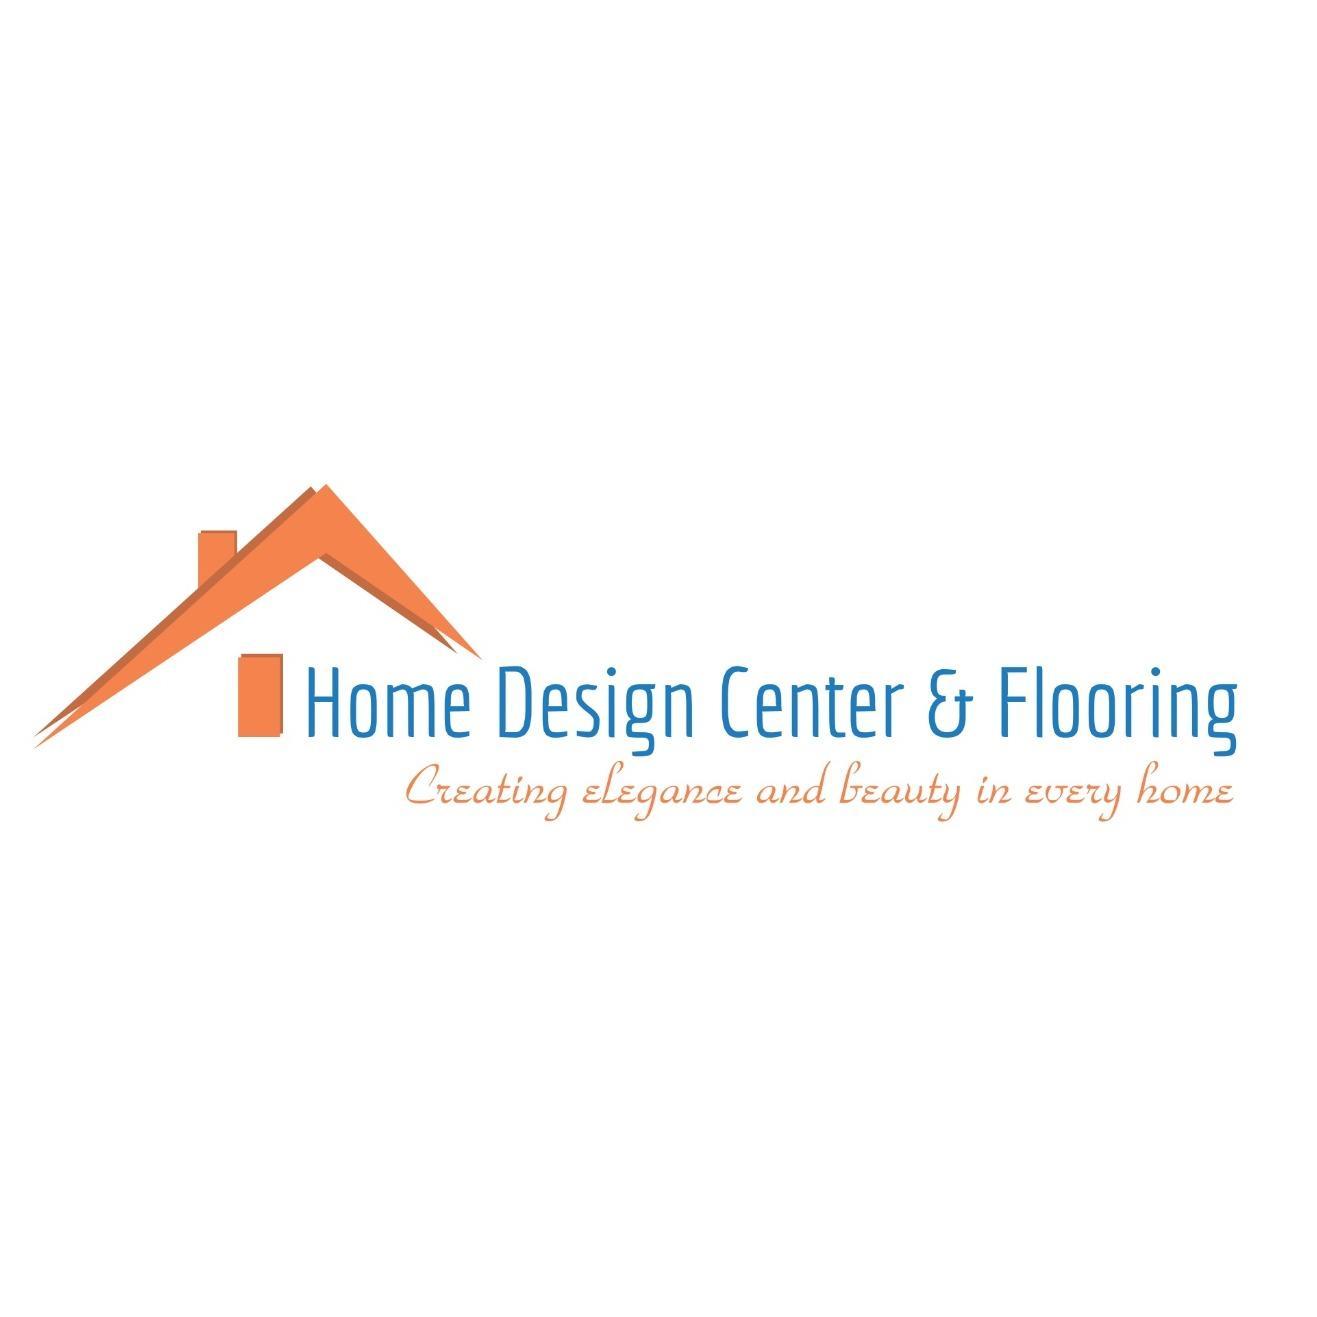 Home Design Center & Flooring - Vienna, VA - General Contractors